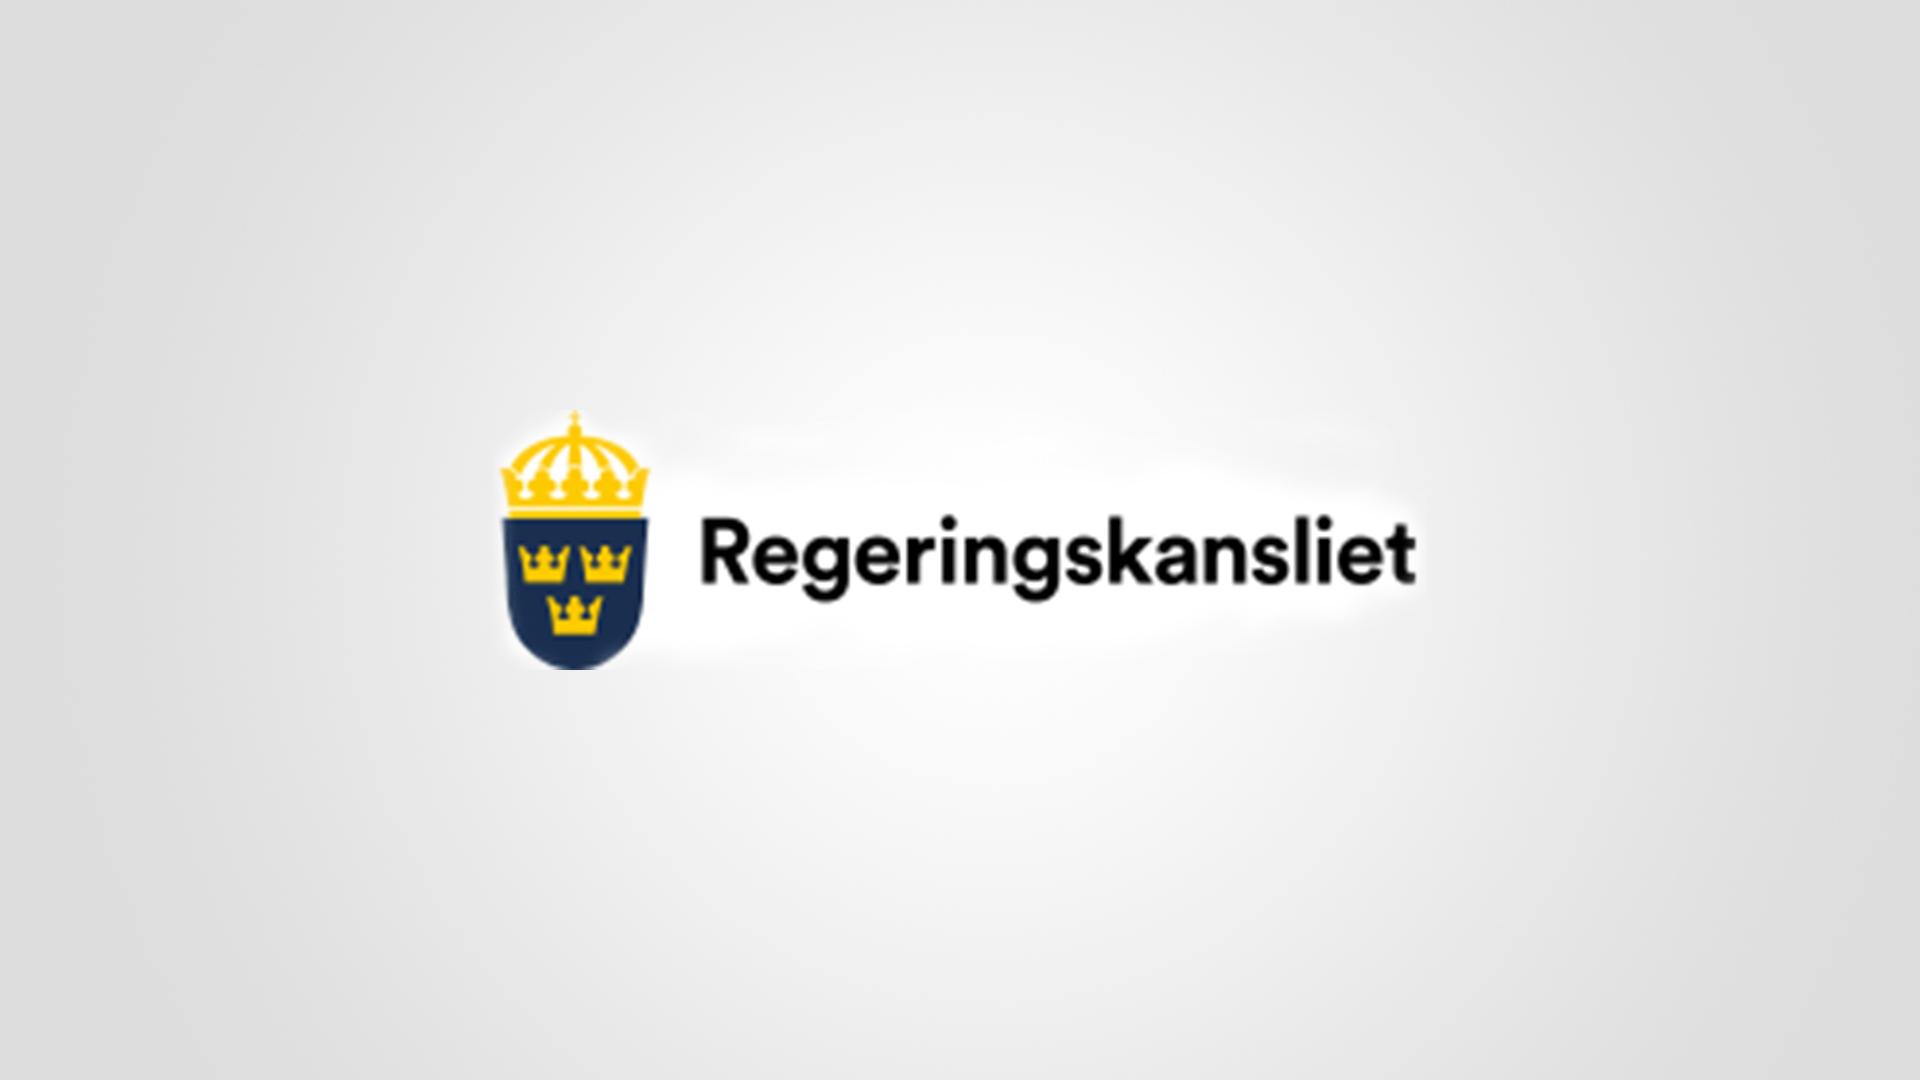 Regeringskansliets logotyp.